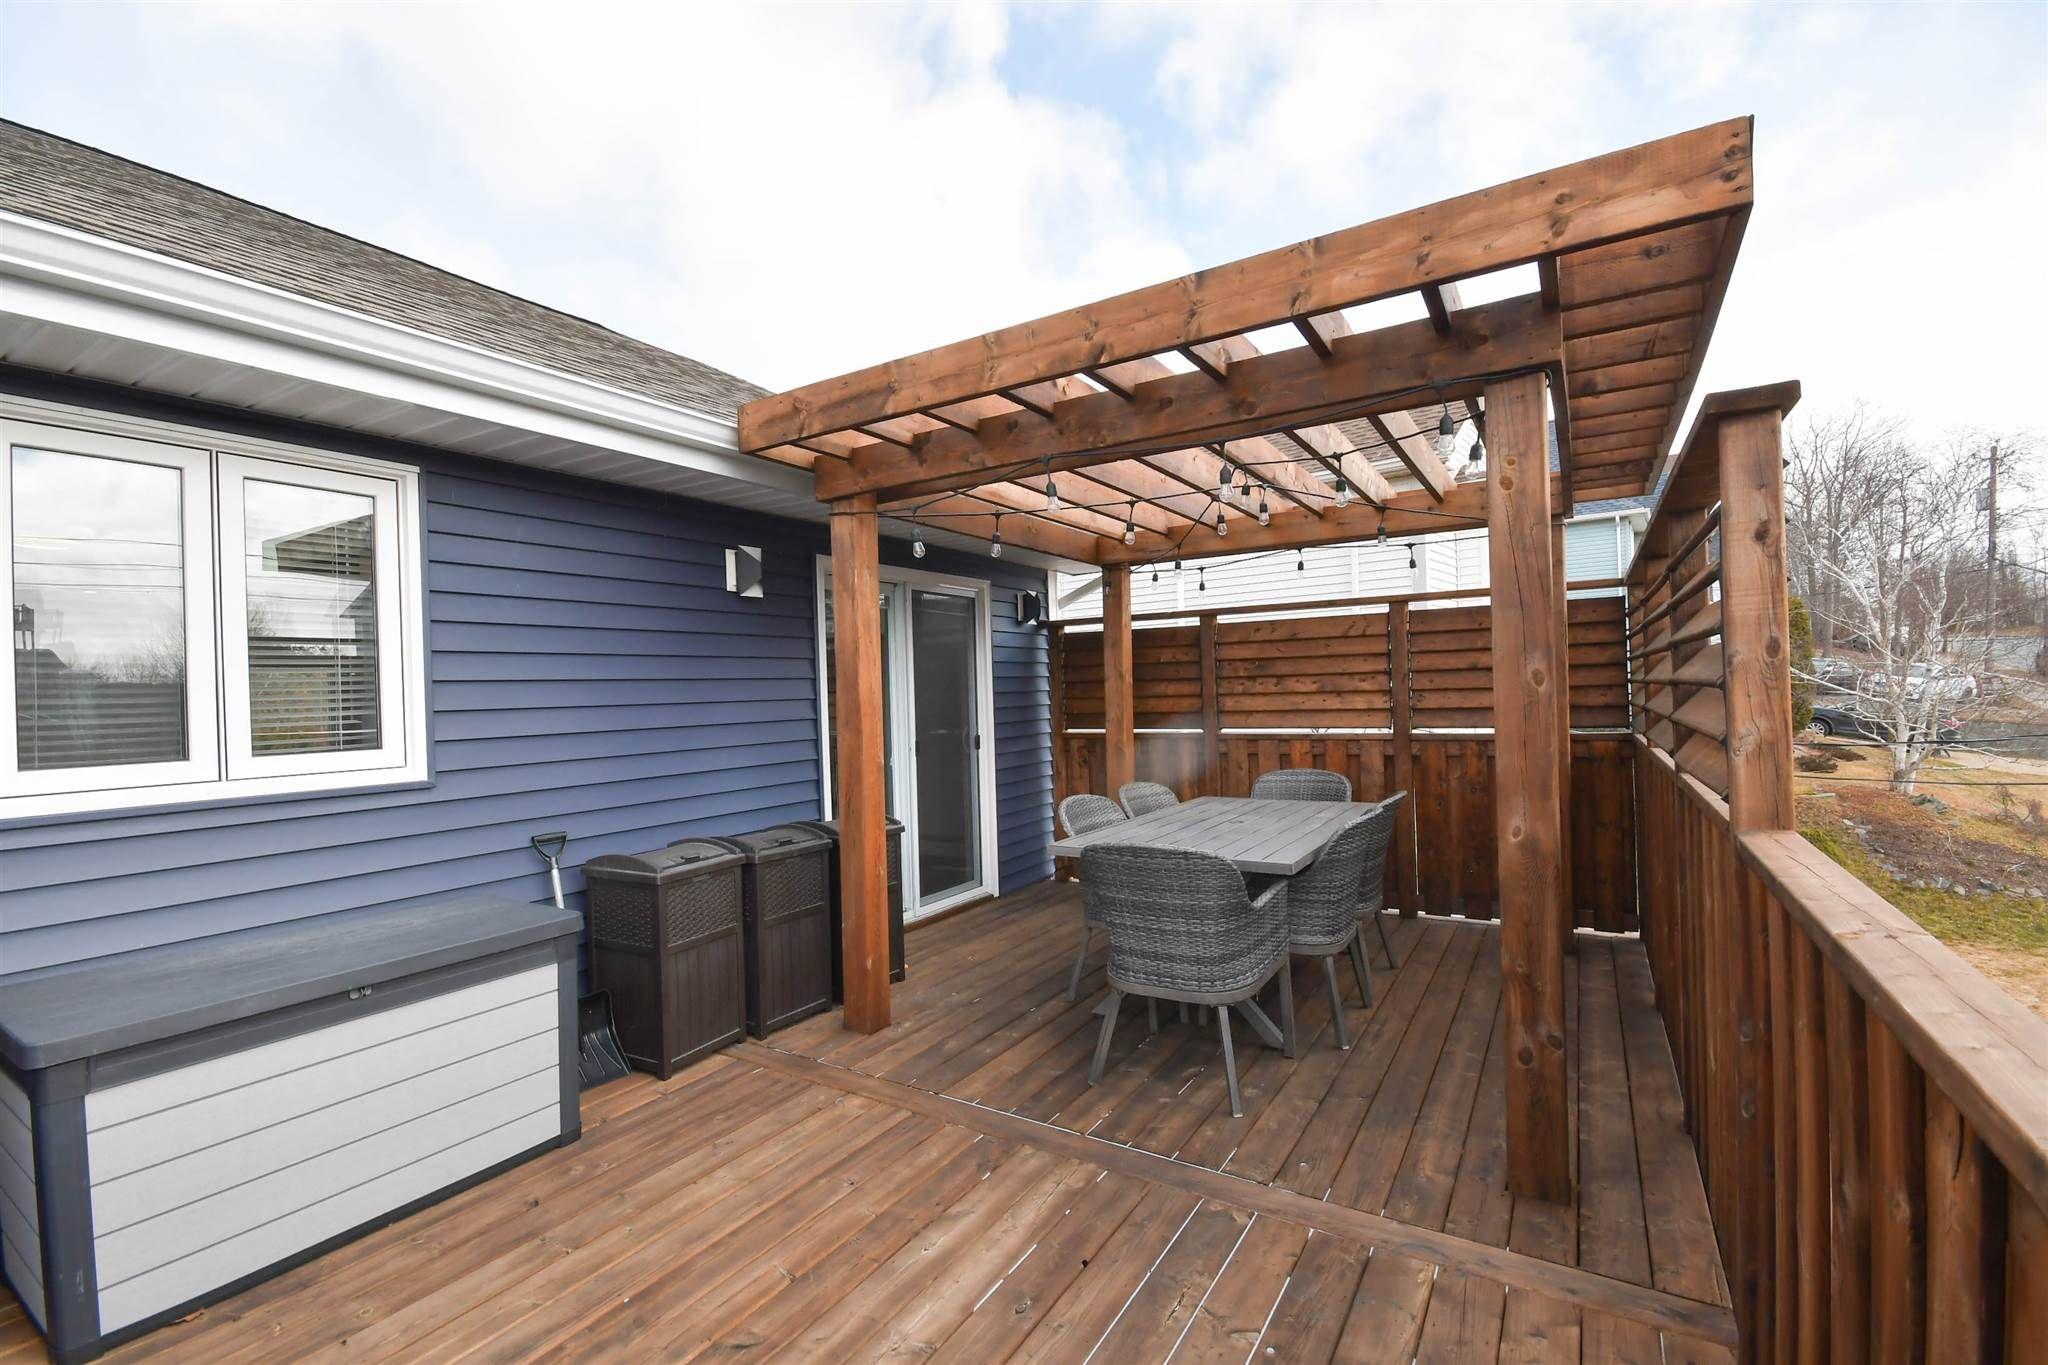 Photo 25: Photos: 17 Armstrong Court in Halifax: 5-Fairmount, Clayton Park, Rockingham Residential for sale (Halifax-Dartmouth)  : MLS®# 202105075